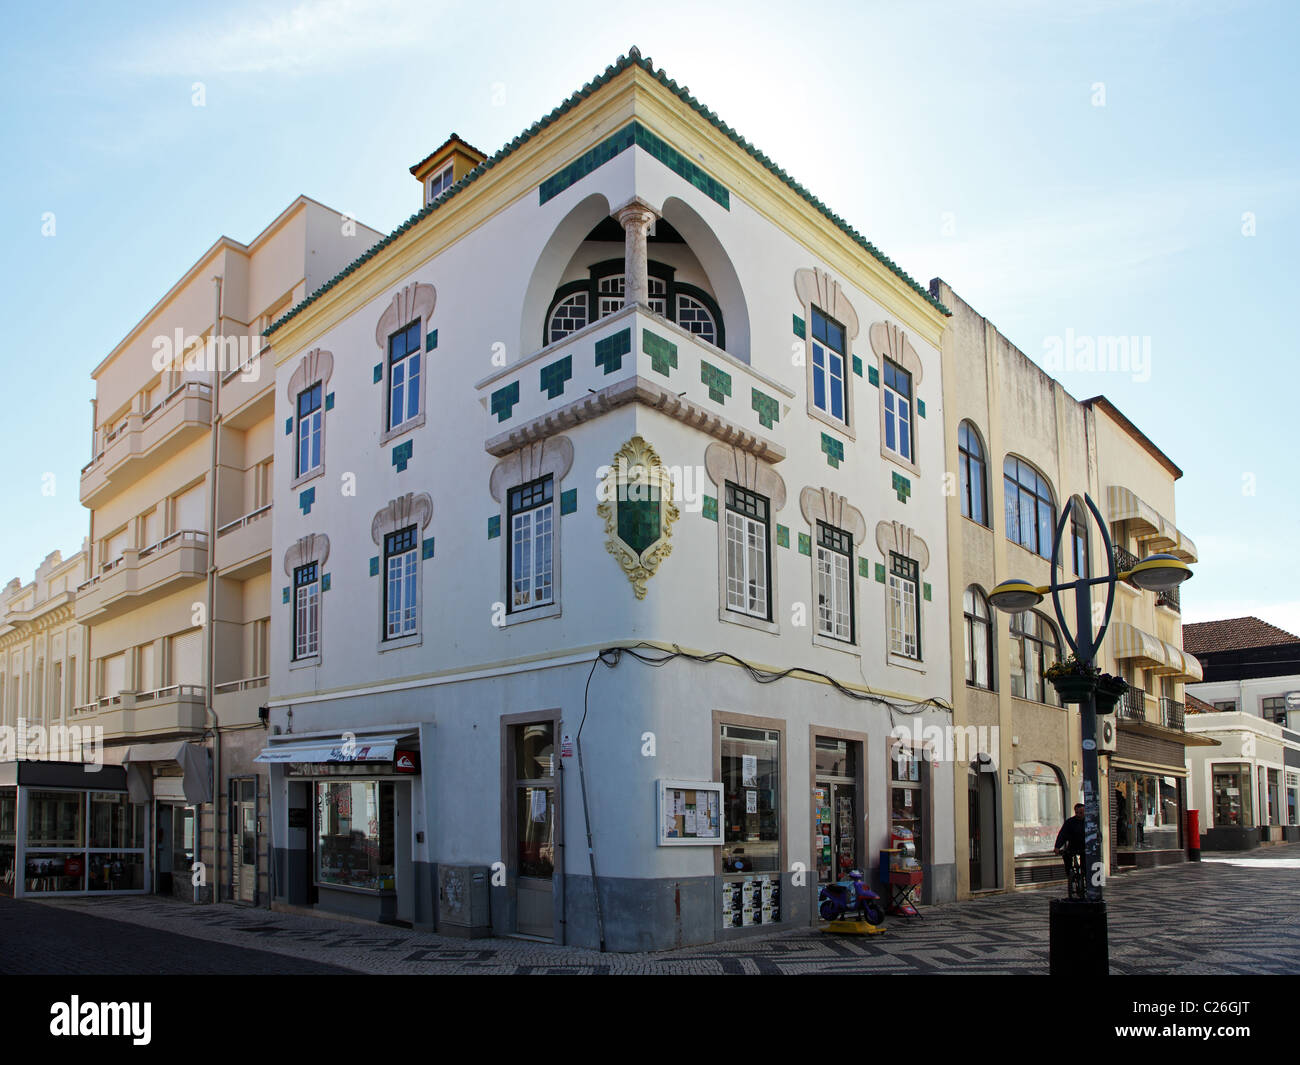 Deco Architektur deco architektur figueira da foz portugal stockfoto bild